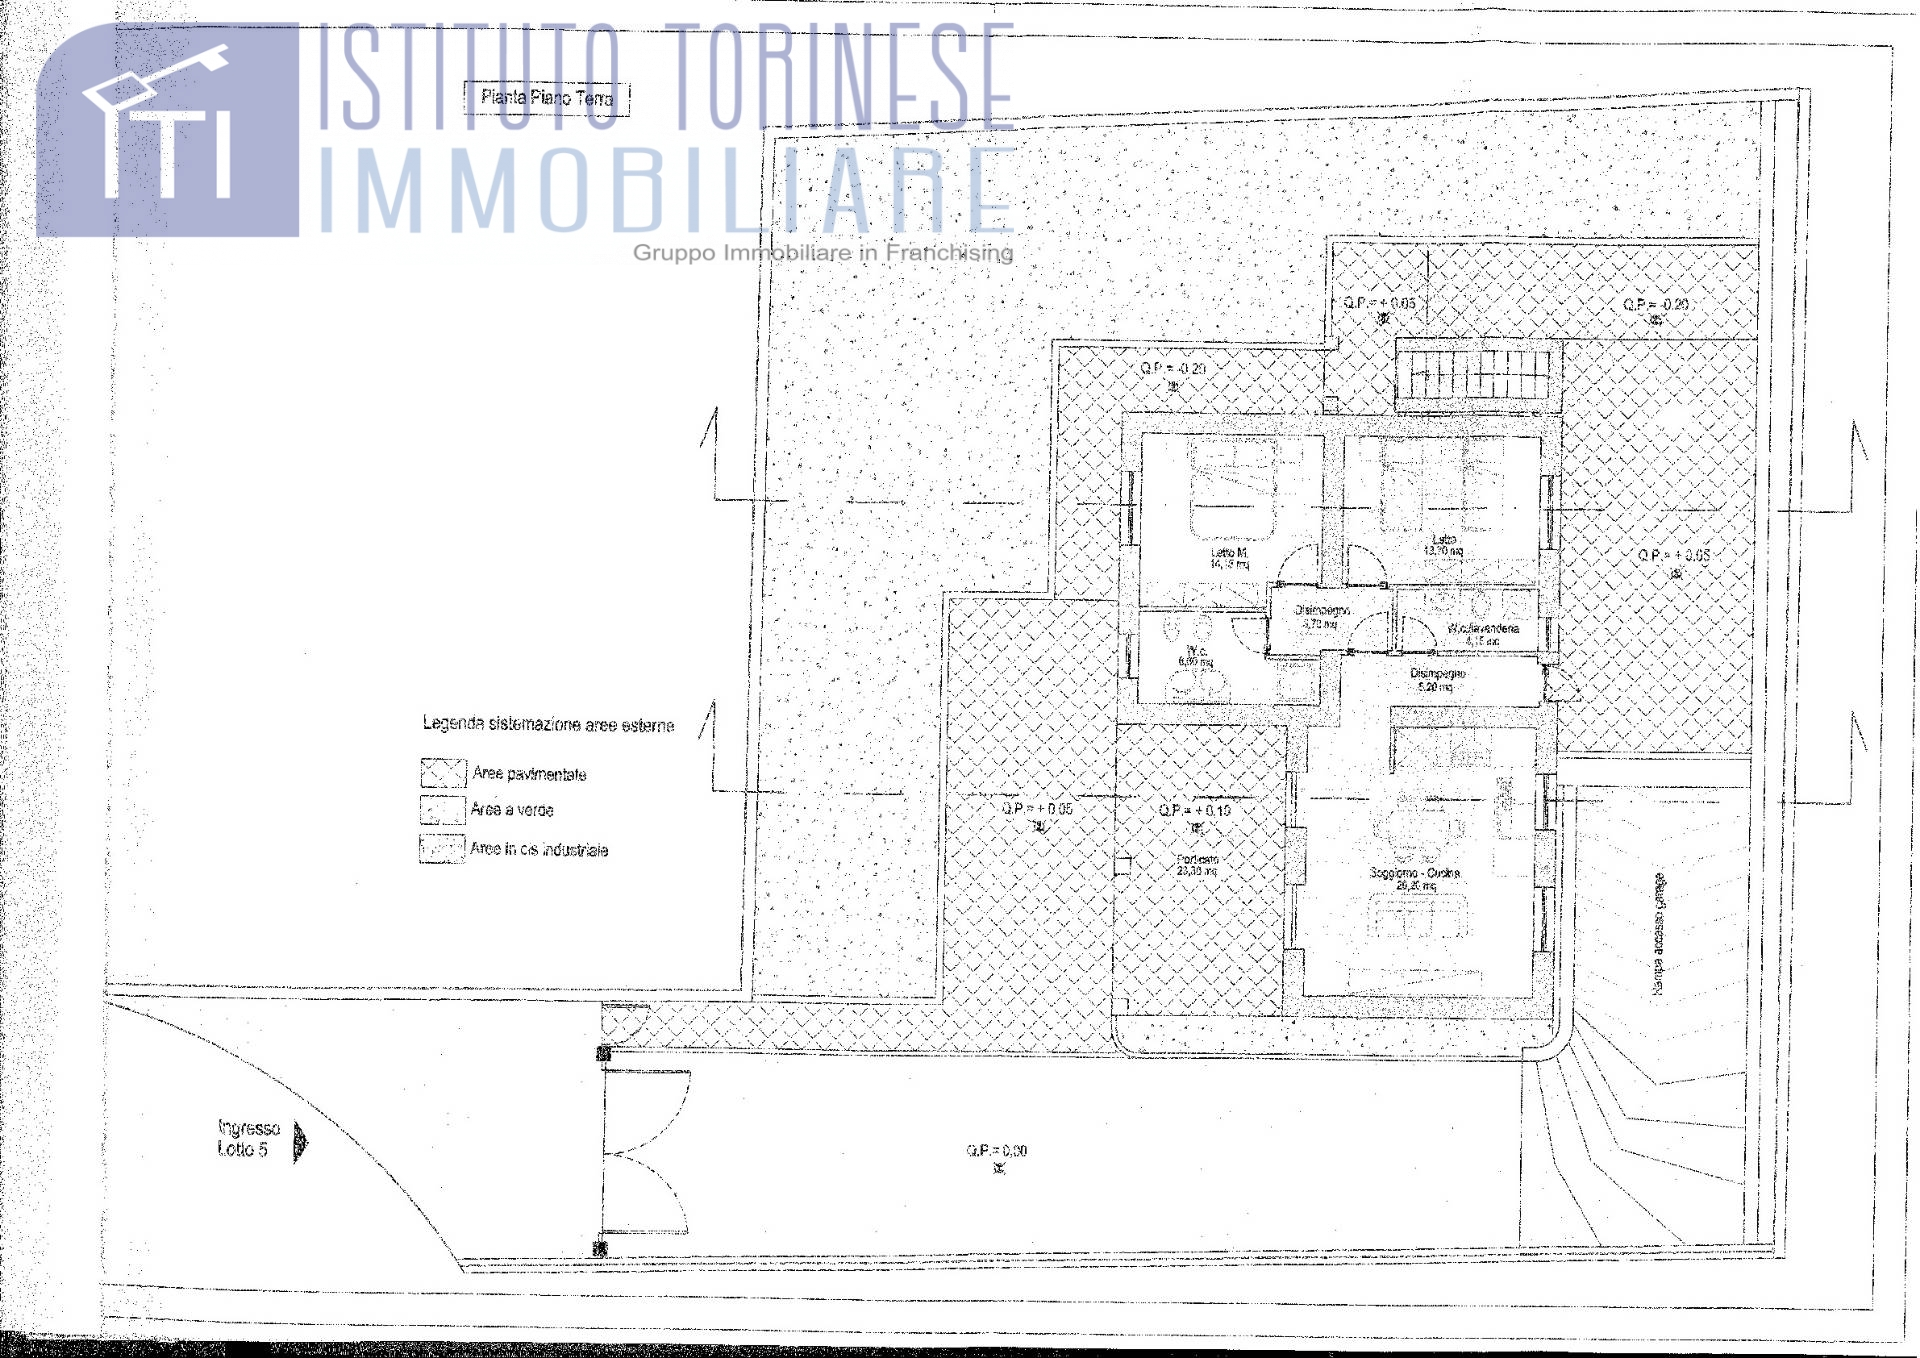 benevento vendita quart: contrade istituto torinese immobiliare